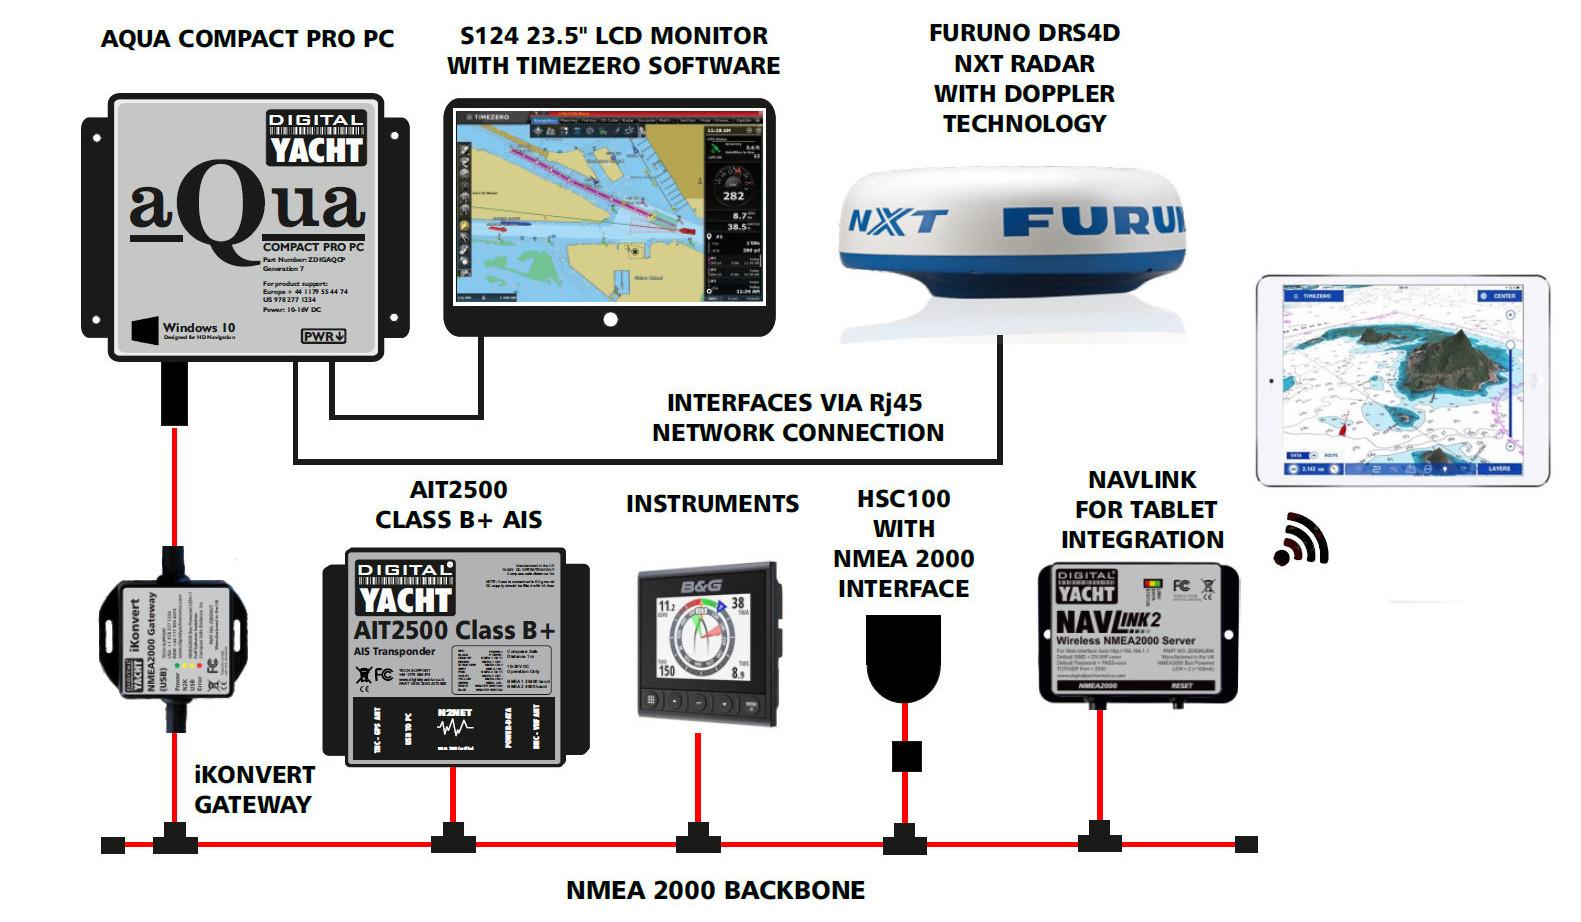 PC Nav System with Furuno Radar and Timezero Software